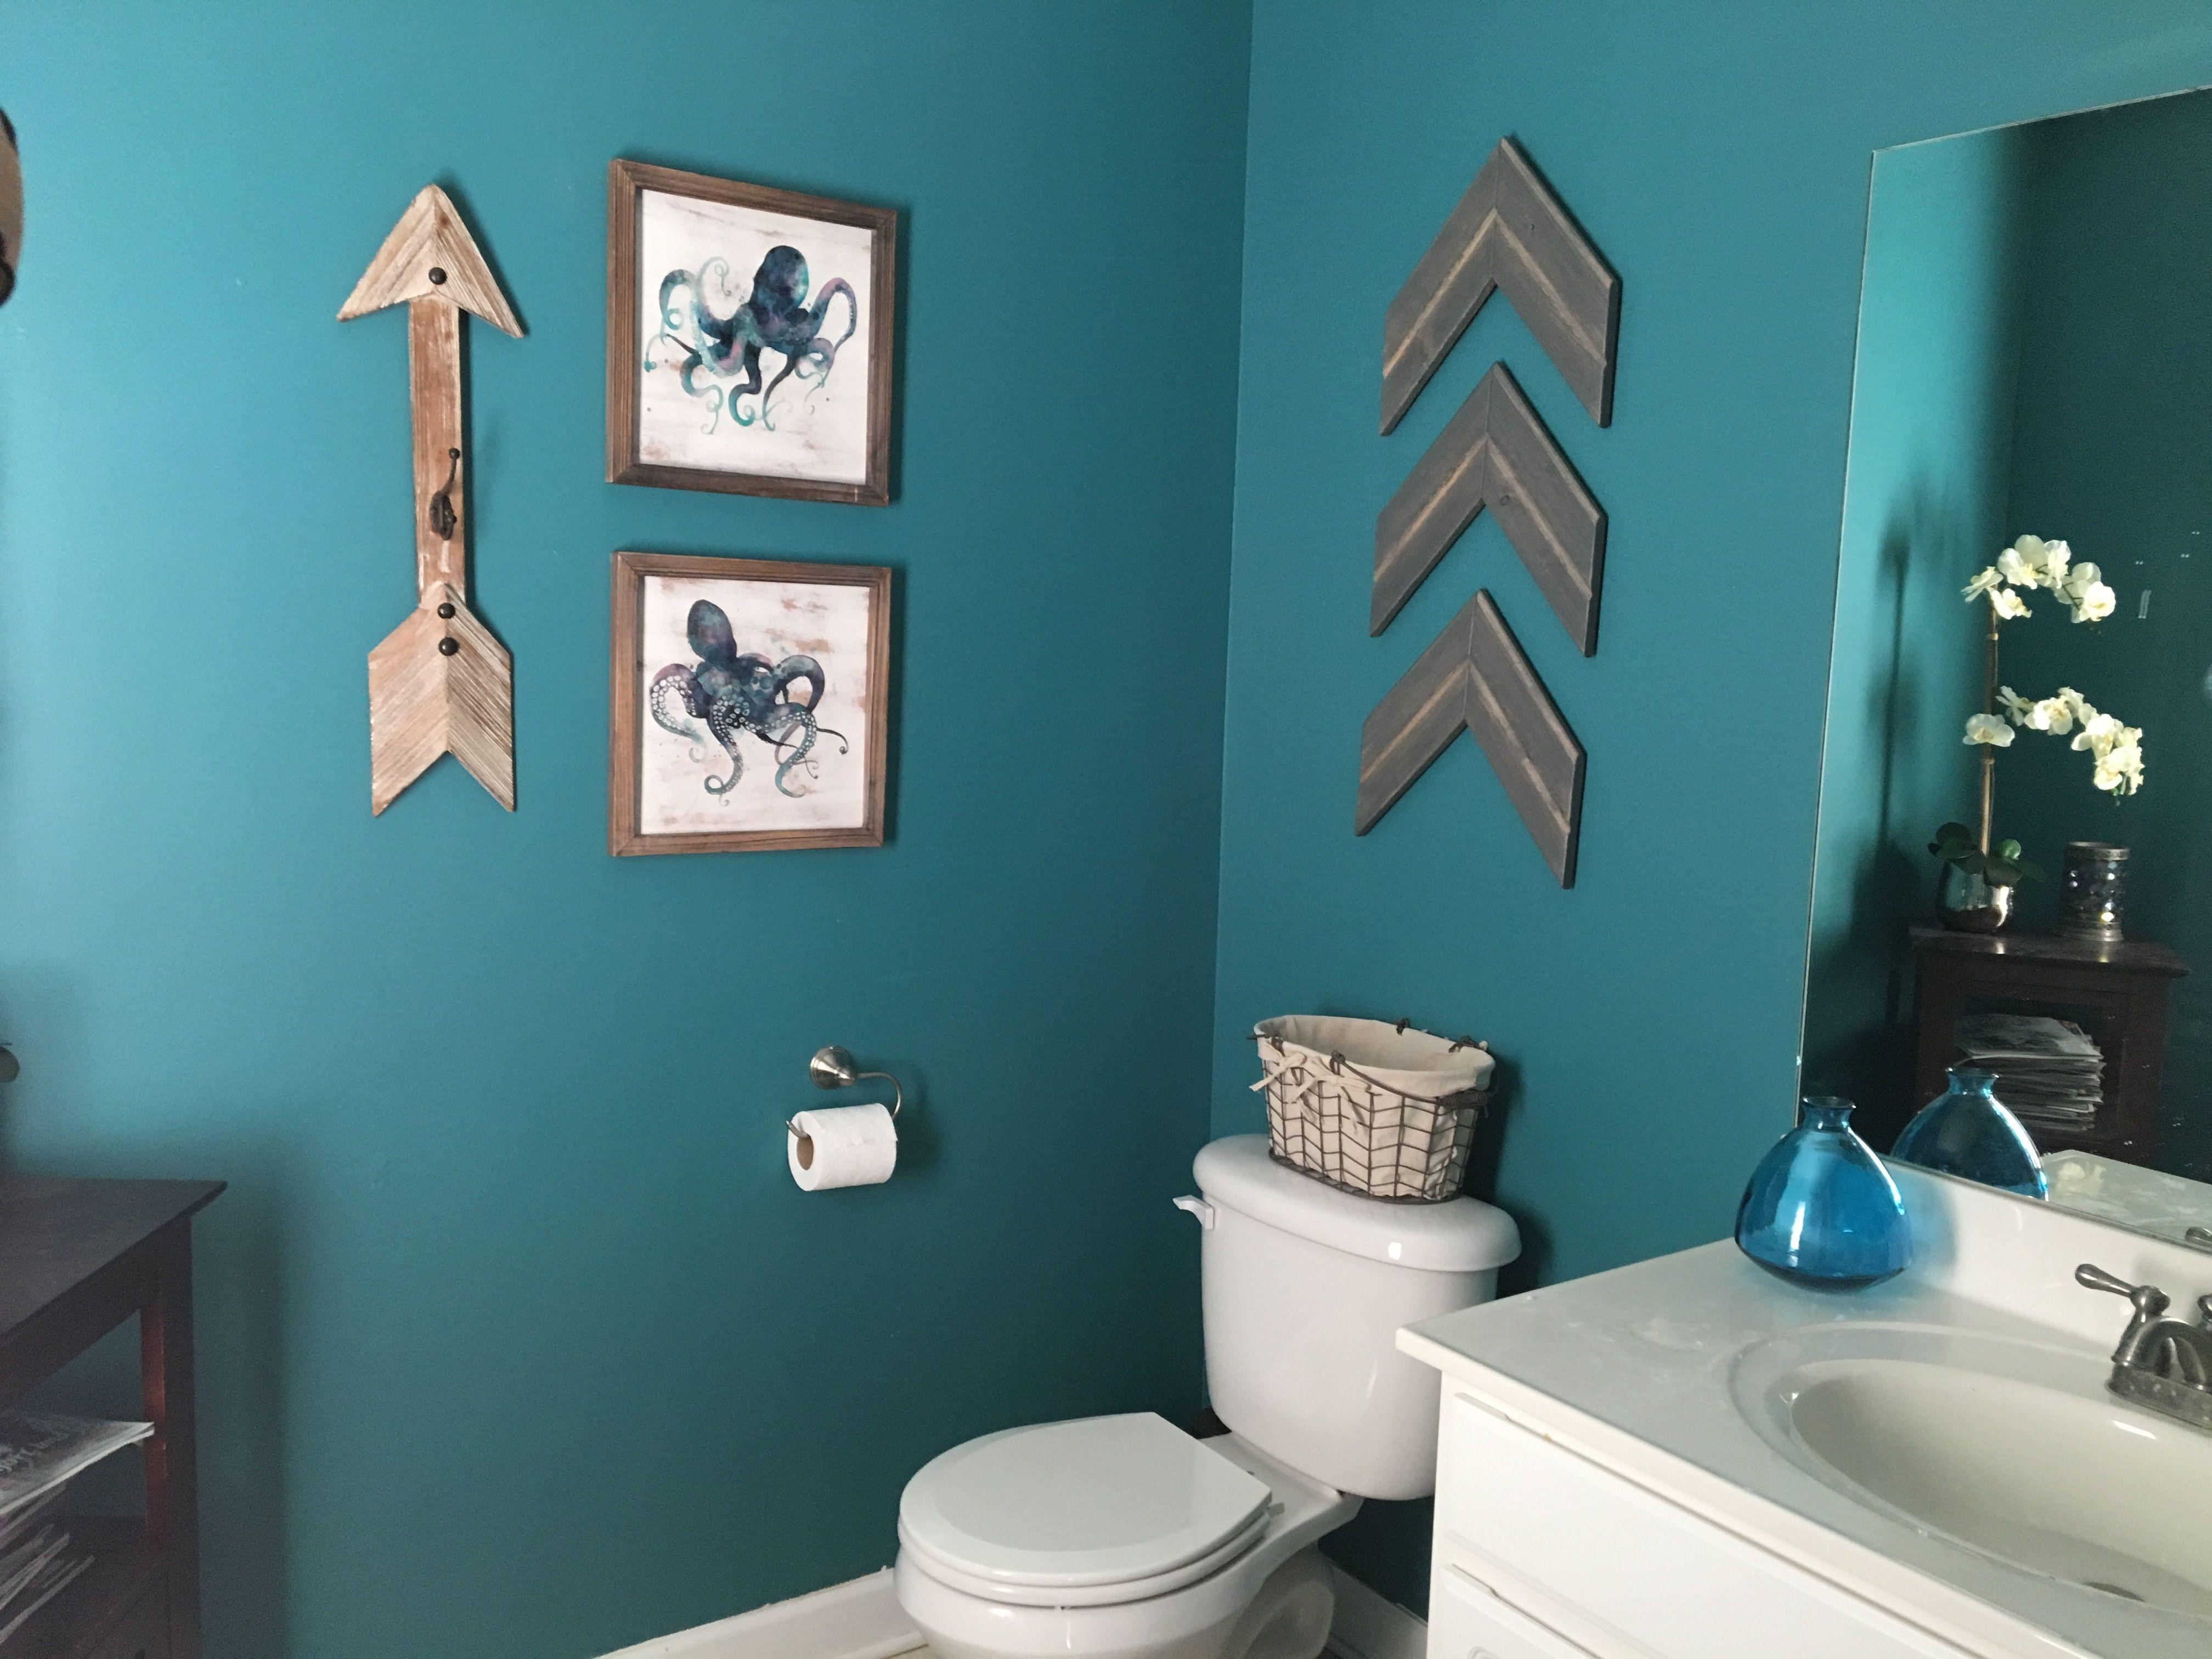 Teal Bathroom Rustic Arrows Teal Bathroom Blue Bathroom Decor